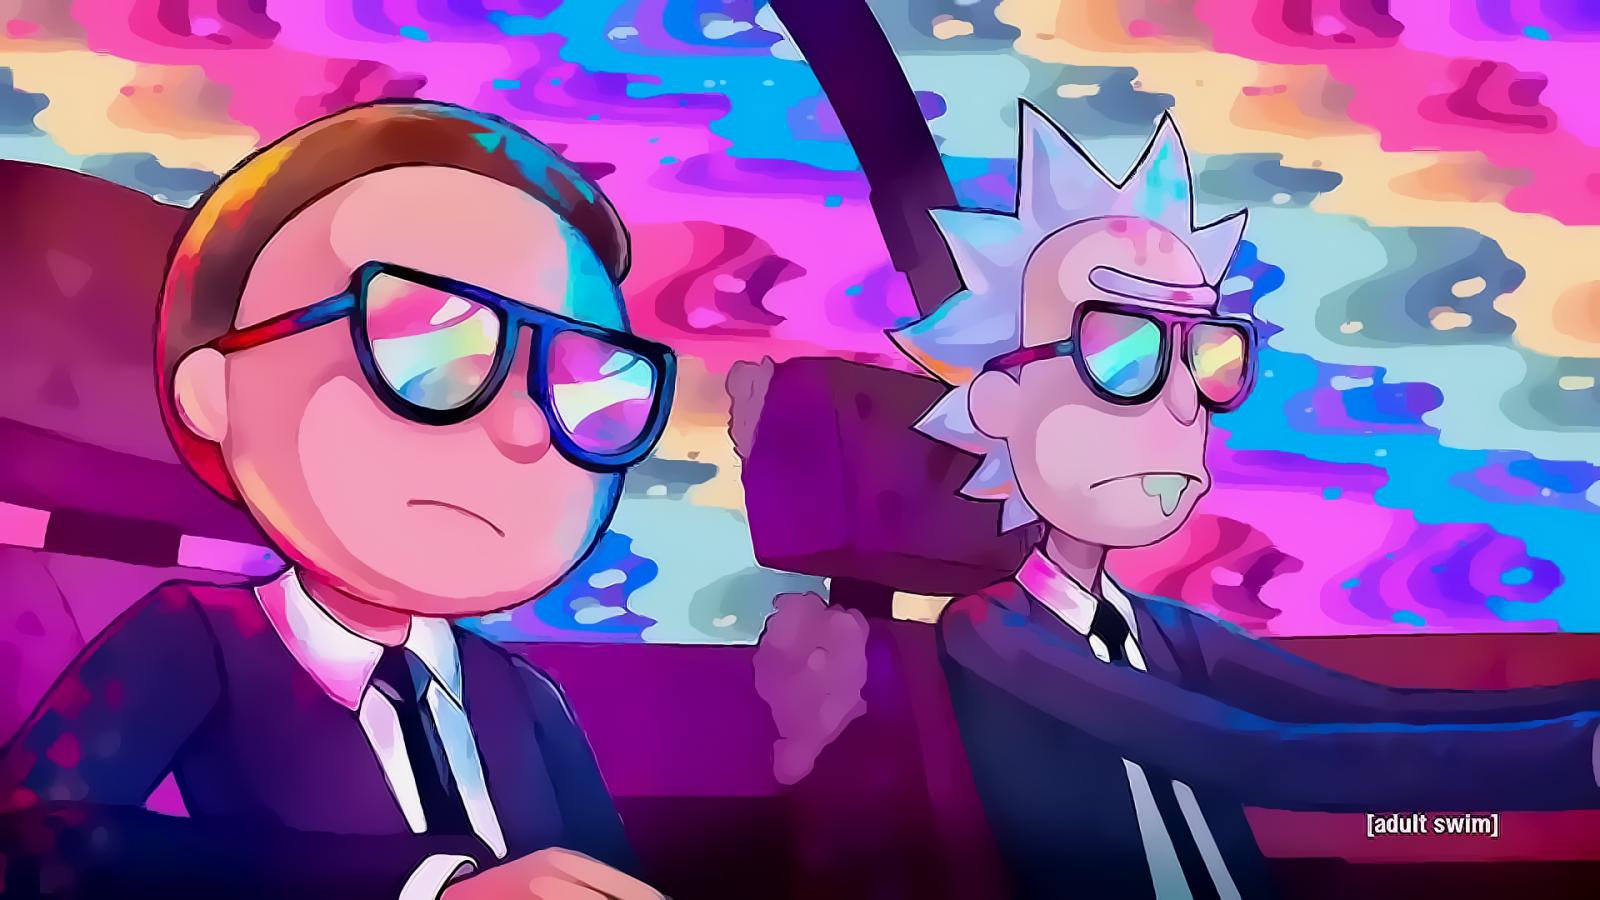 Wallpaper : Rick and Morty, sunglasses 1920x1080 ...